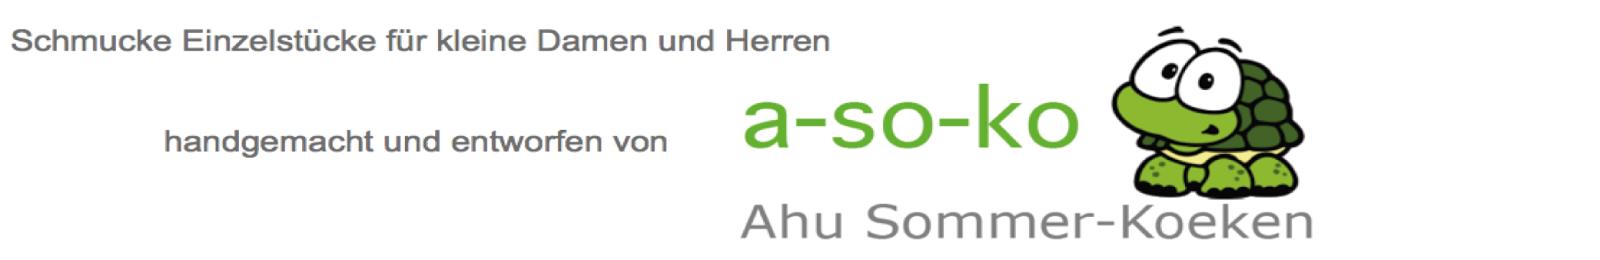 a-so-ko